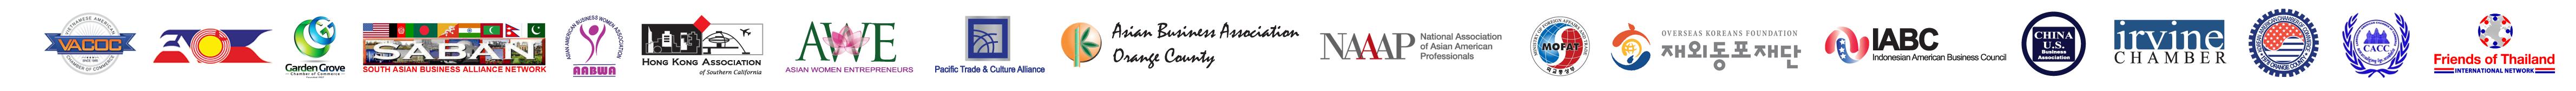 2015 Expo Entity logos_1